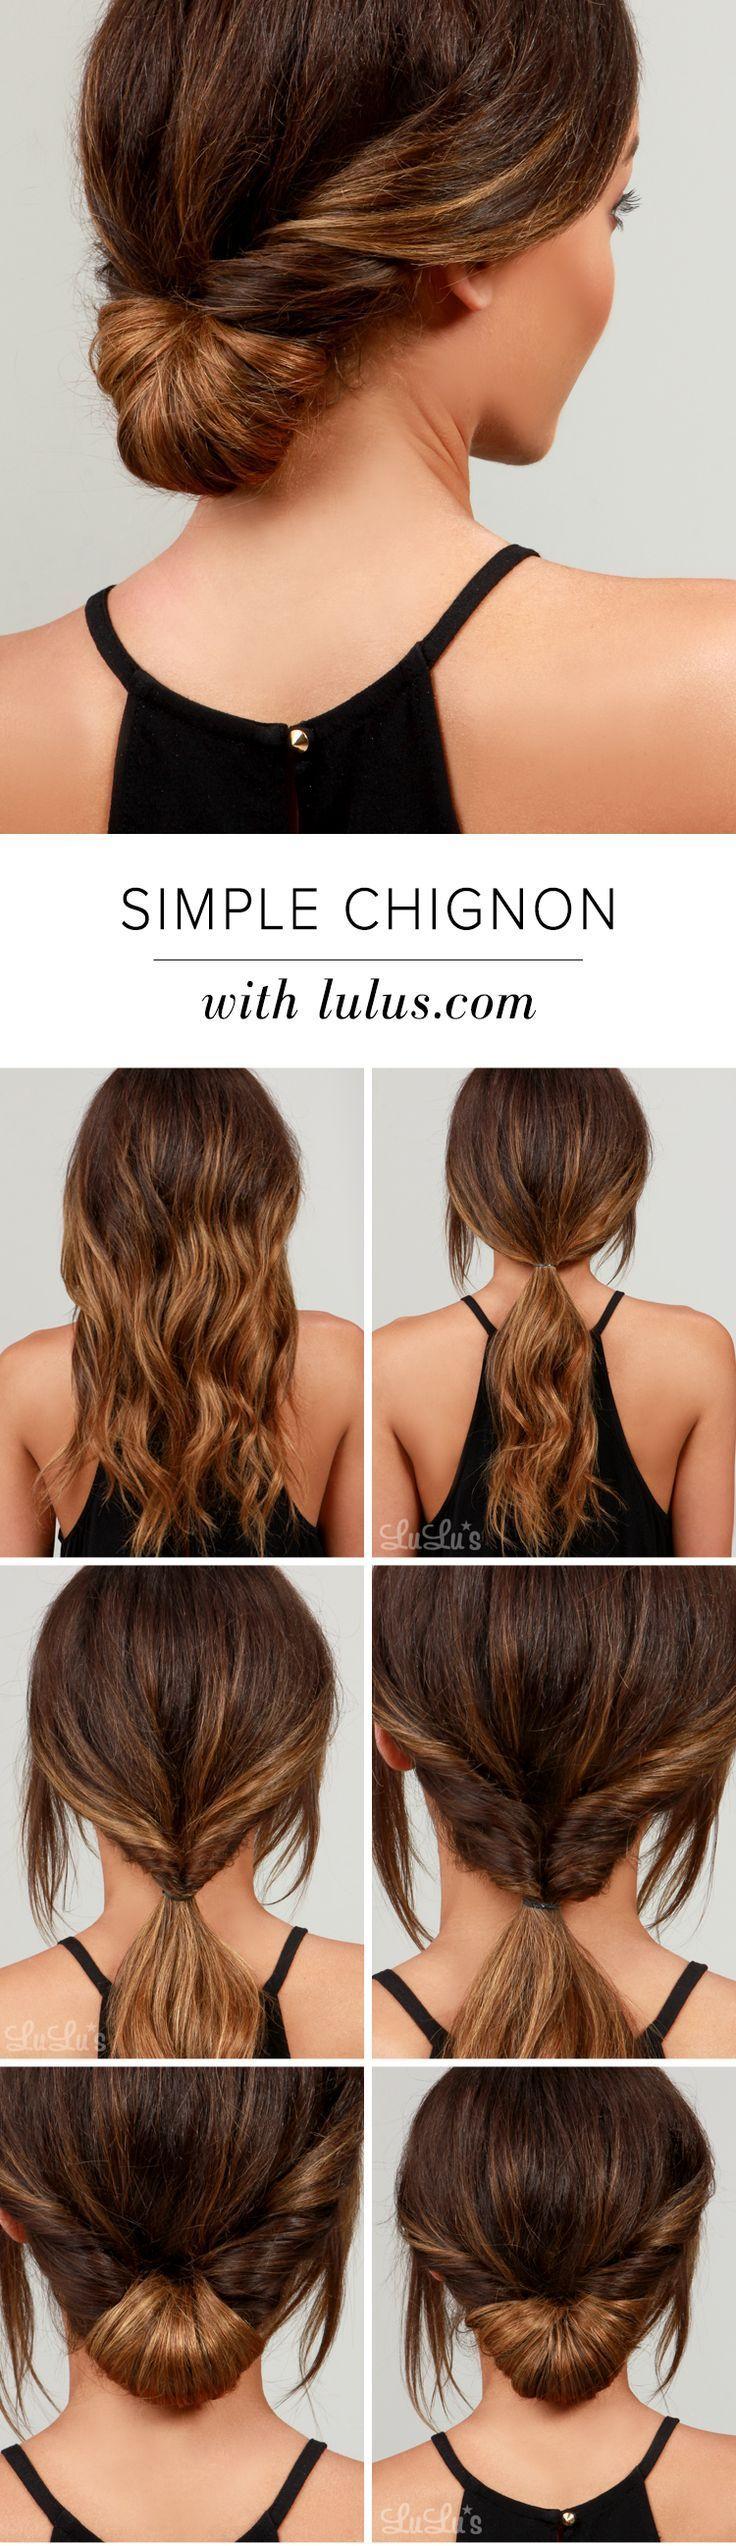 LuLu*s How-To: Simple Chignon Hair Tutorial